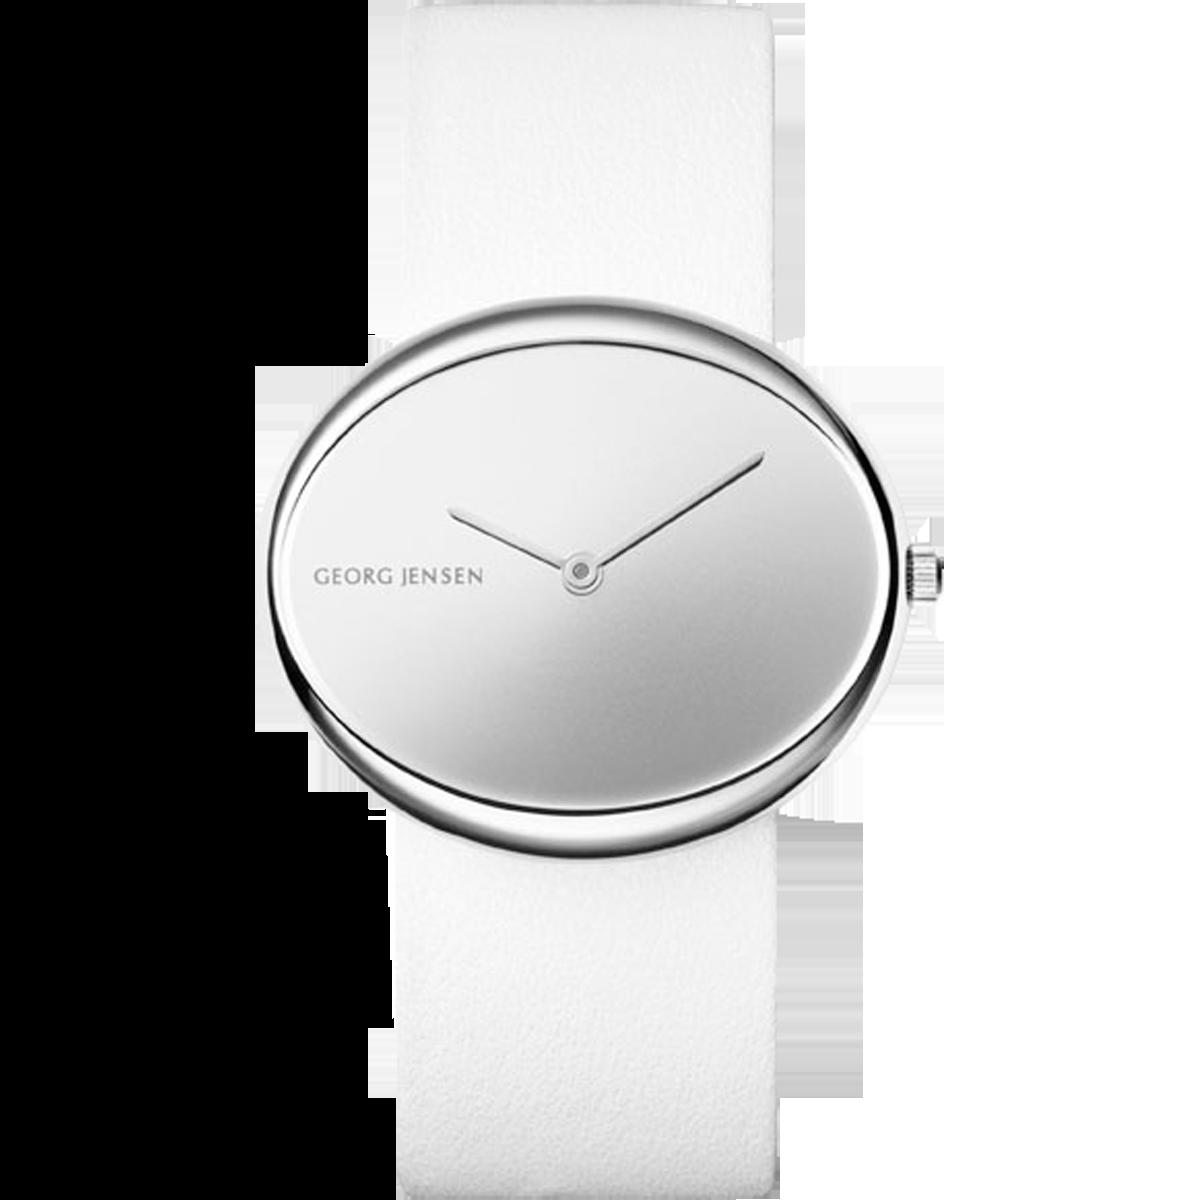 Georg Jensen Vivianna Oval 323 Jewelry Watches